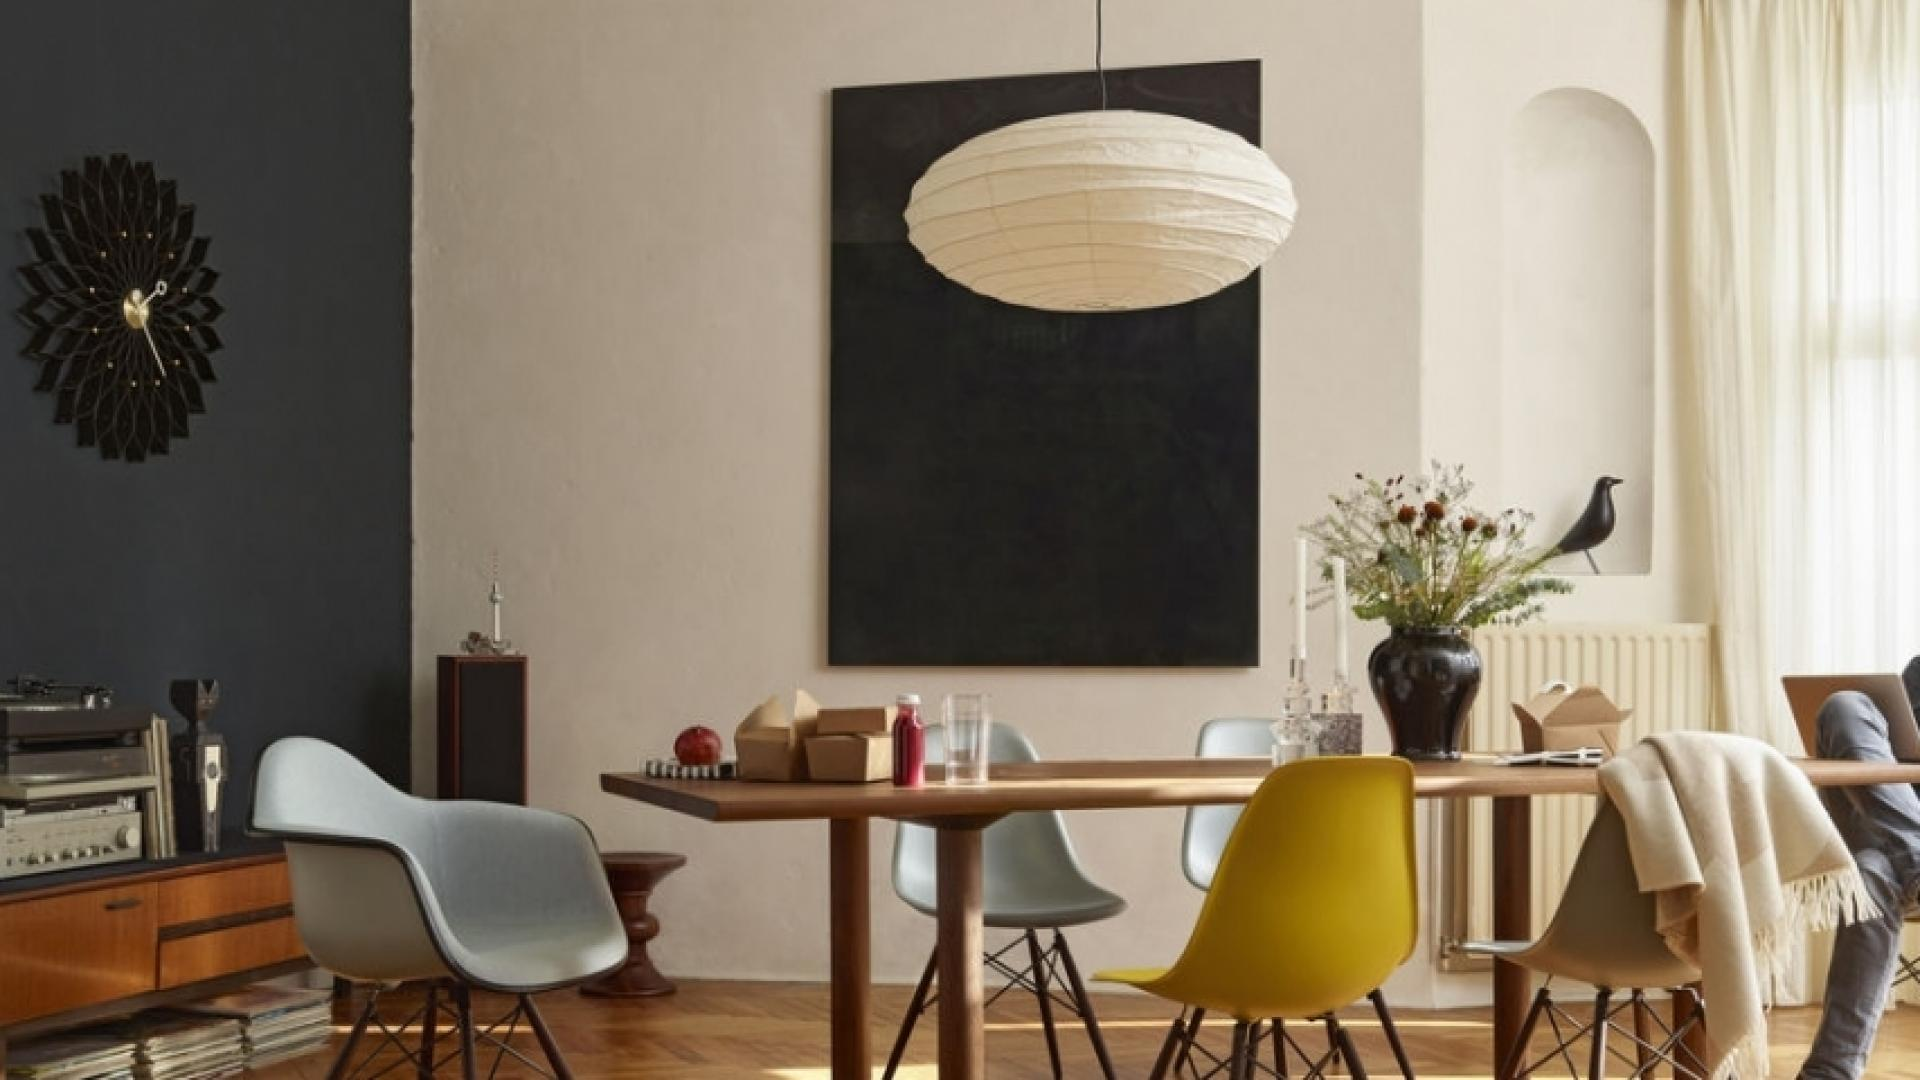 Wood_Table_Eames_Plastic_Side_Chair_DSW_Eames_Palstic_Armchiar_DAW_Wall_Clock_Sunflower_Akari_70N_Eames_Stool_Eames_House_Bird_1102689_preview.jpg